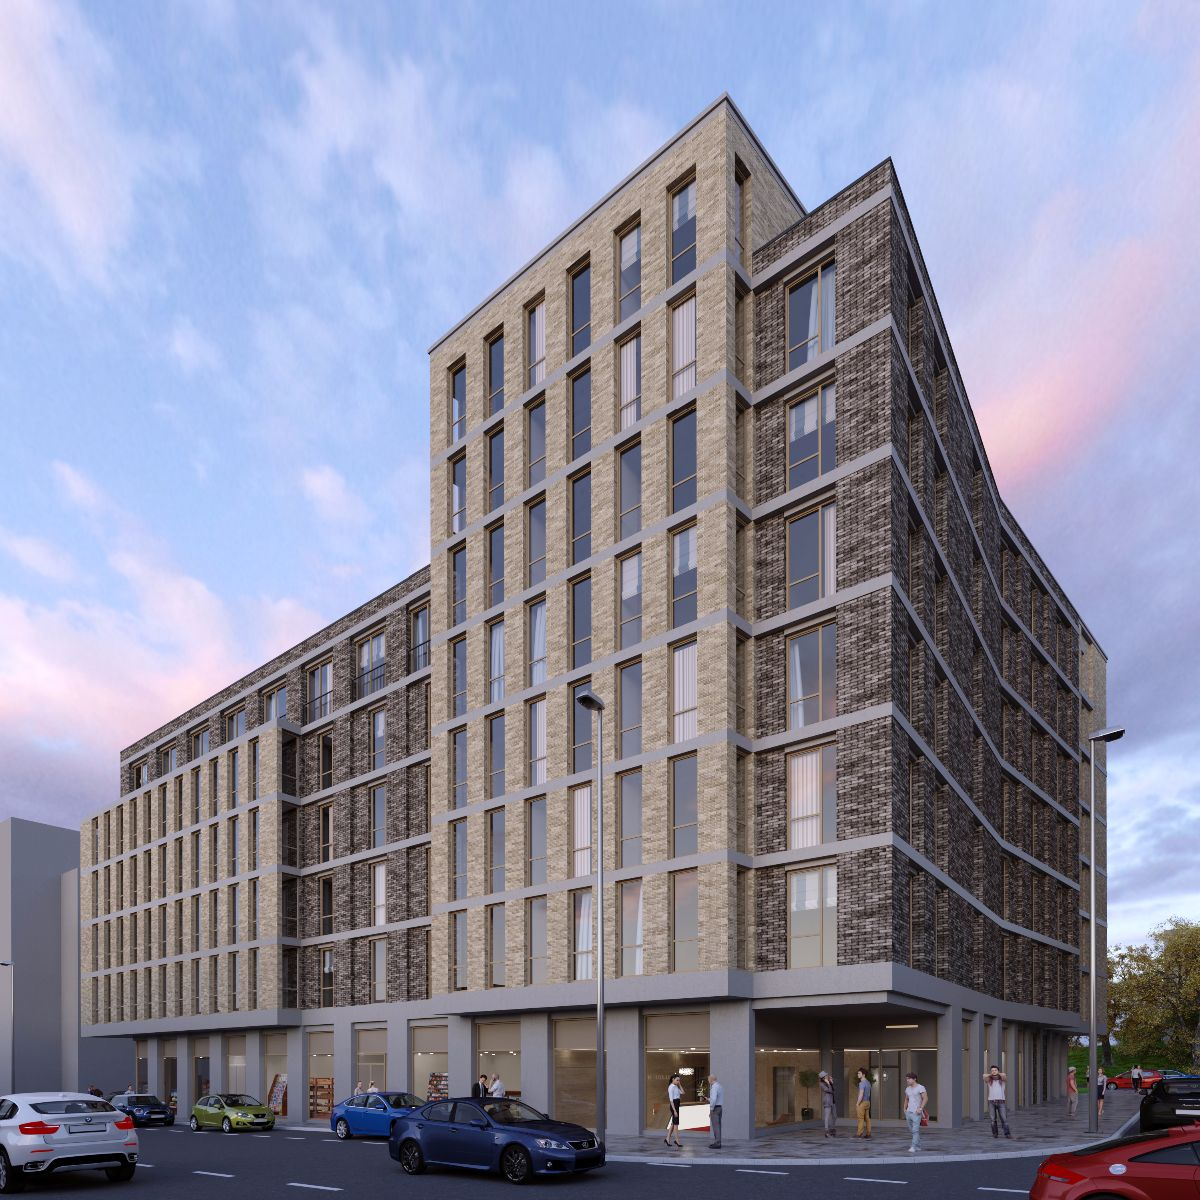 1 Bedroom Apartment For Sale, Devon Street, Liverpool, L3 8HE